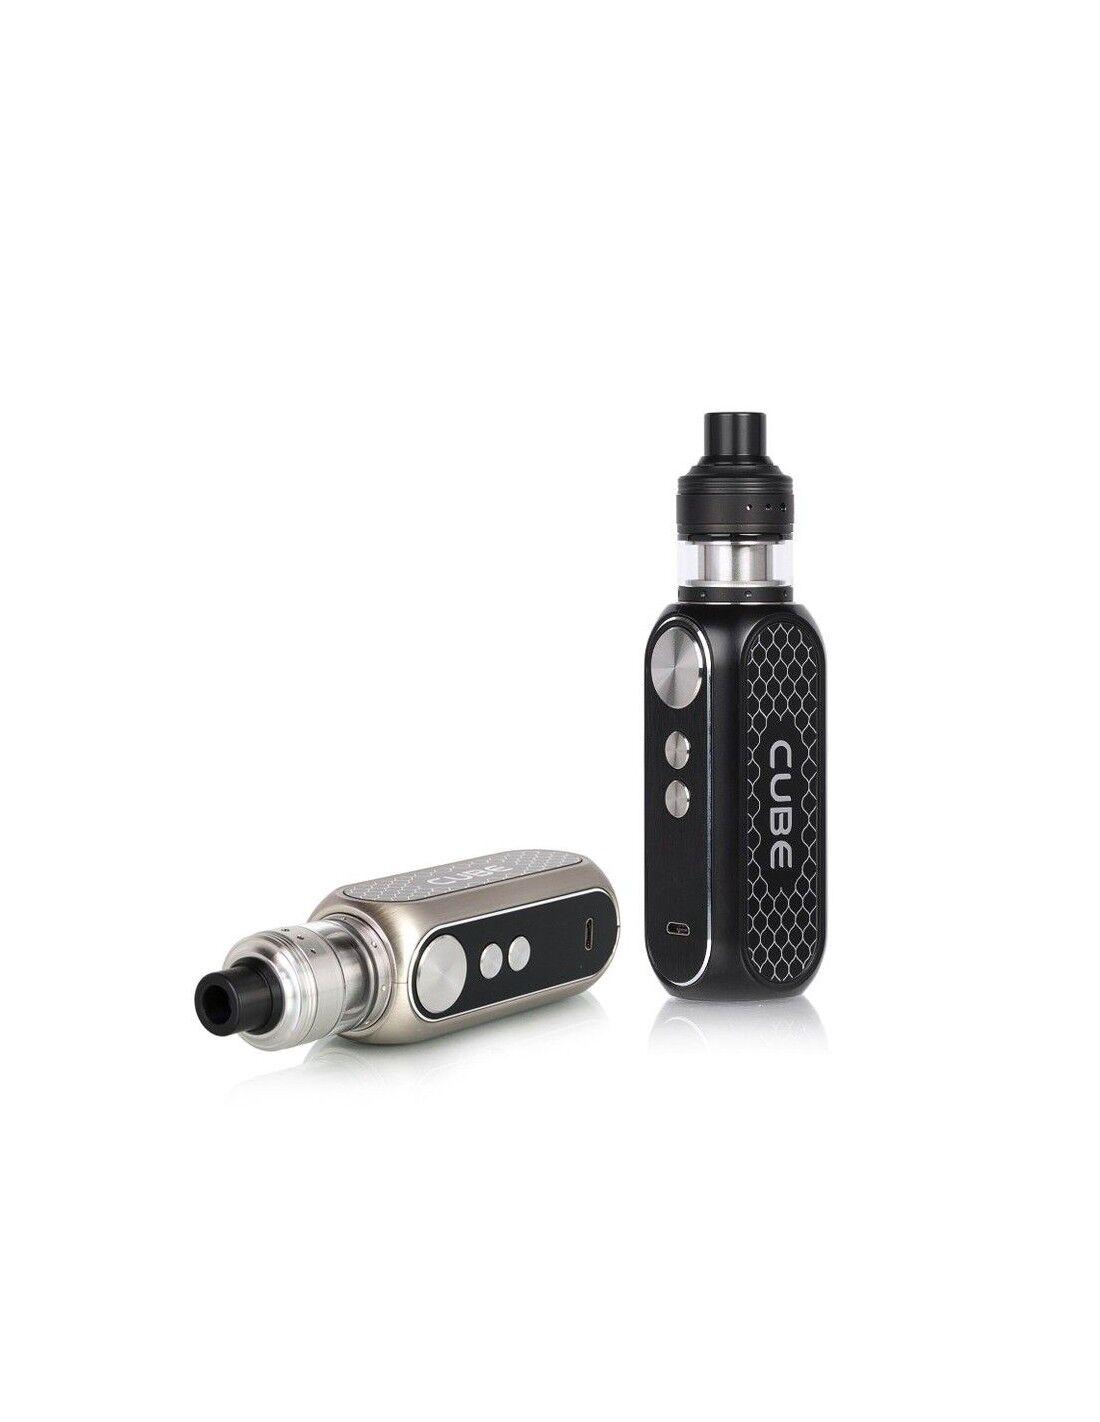 OBS Cube Kit Mtl Sigaretta Elettronica Da 3000mah